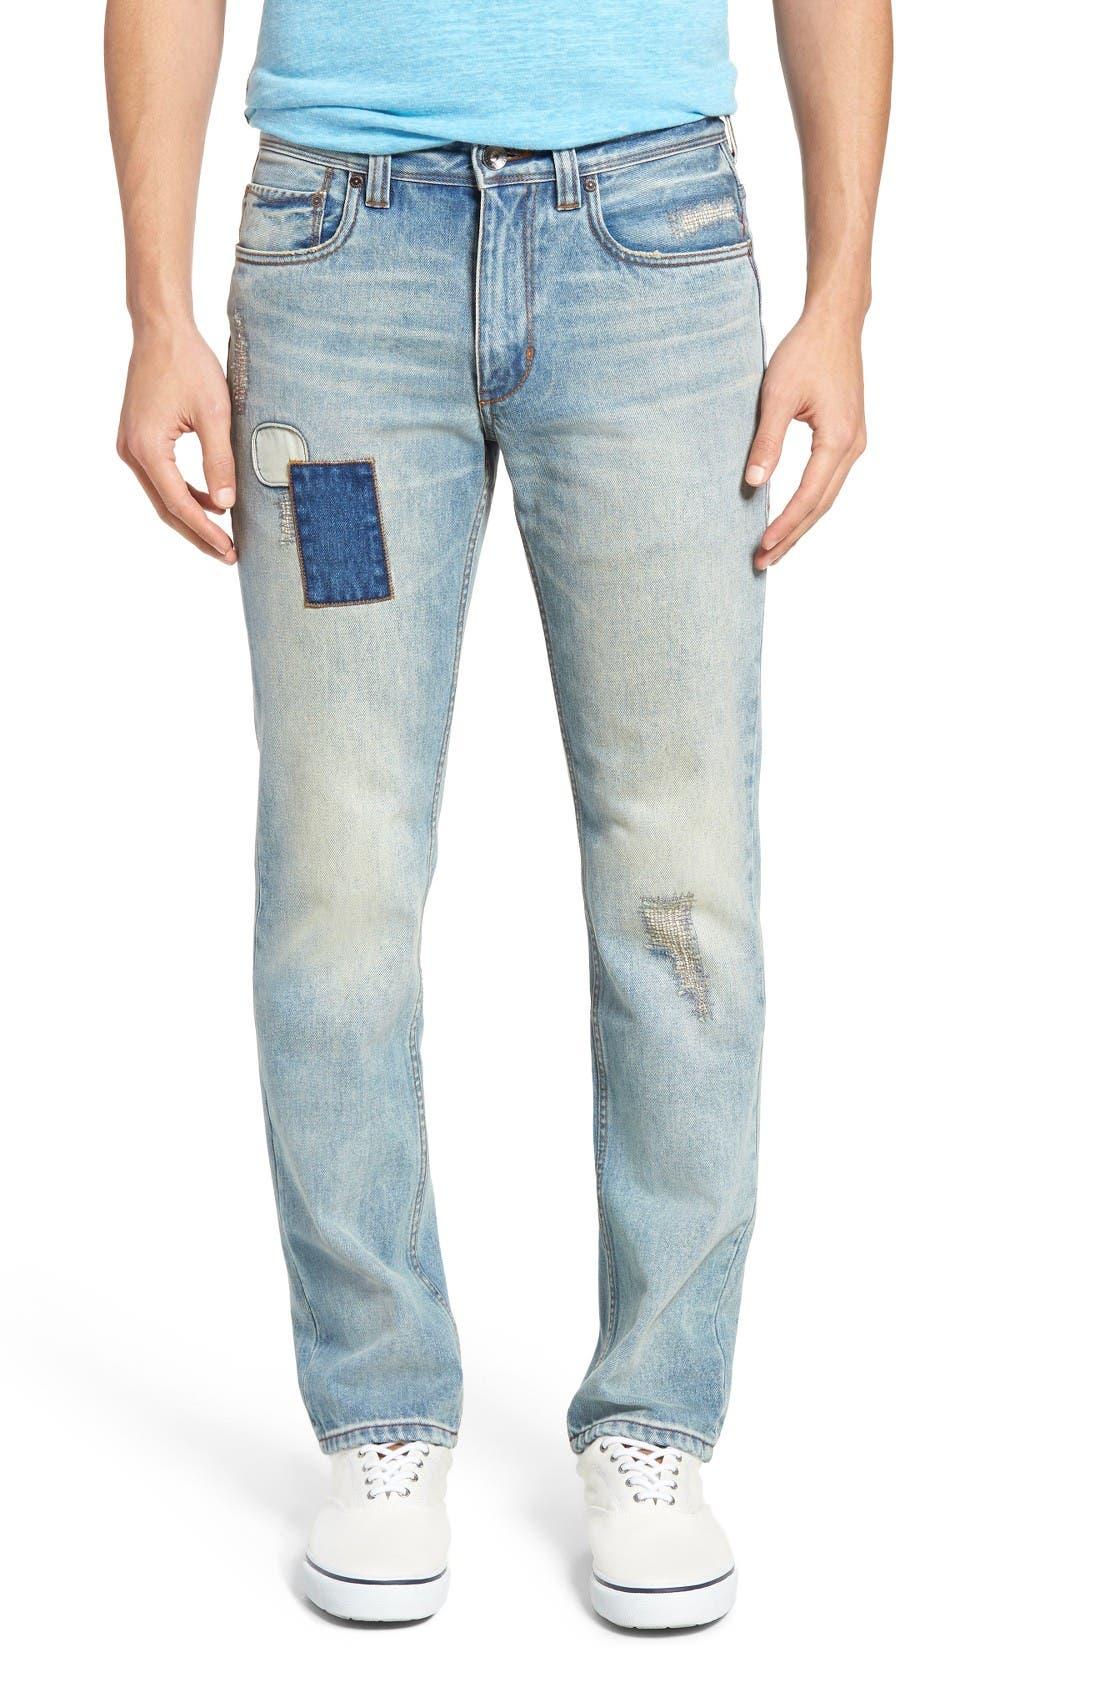 Tommy Bahama Castaway Slim Fit Jeans (Bleached Vintage Wash)